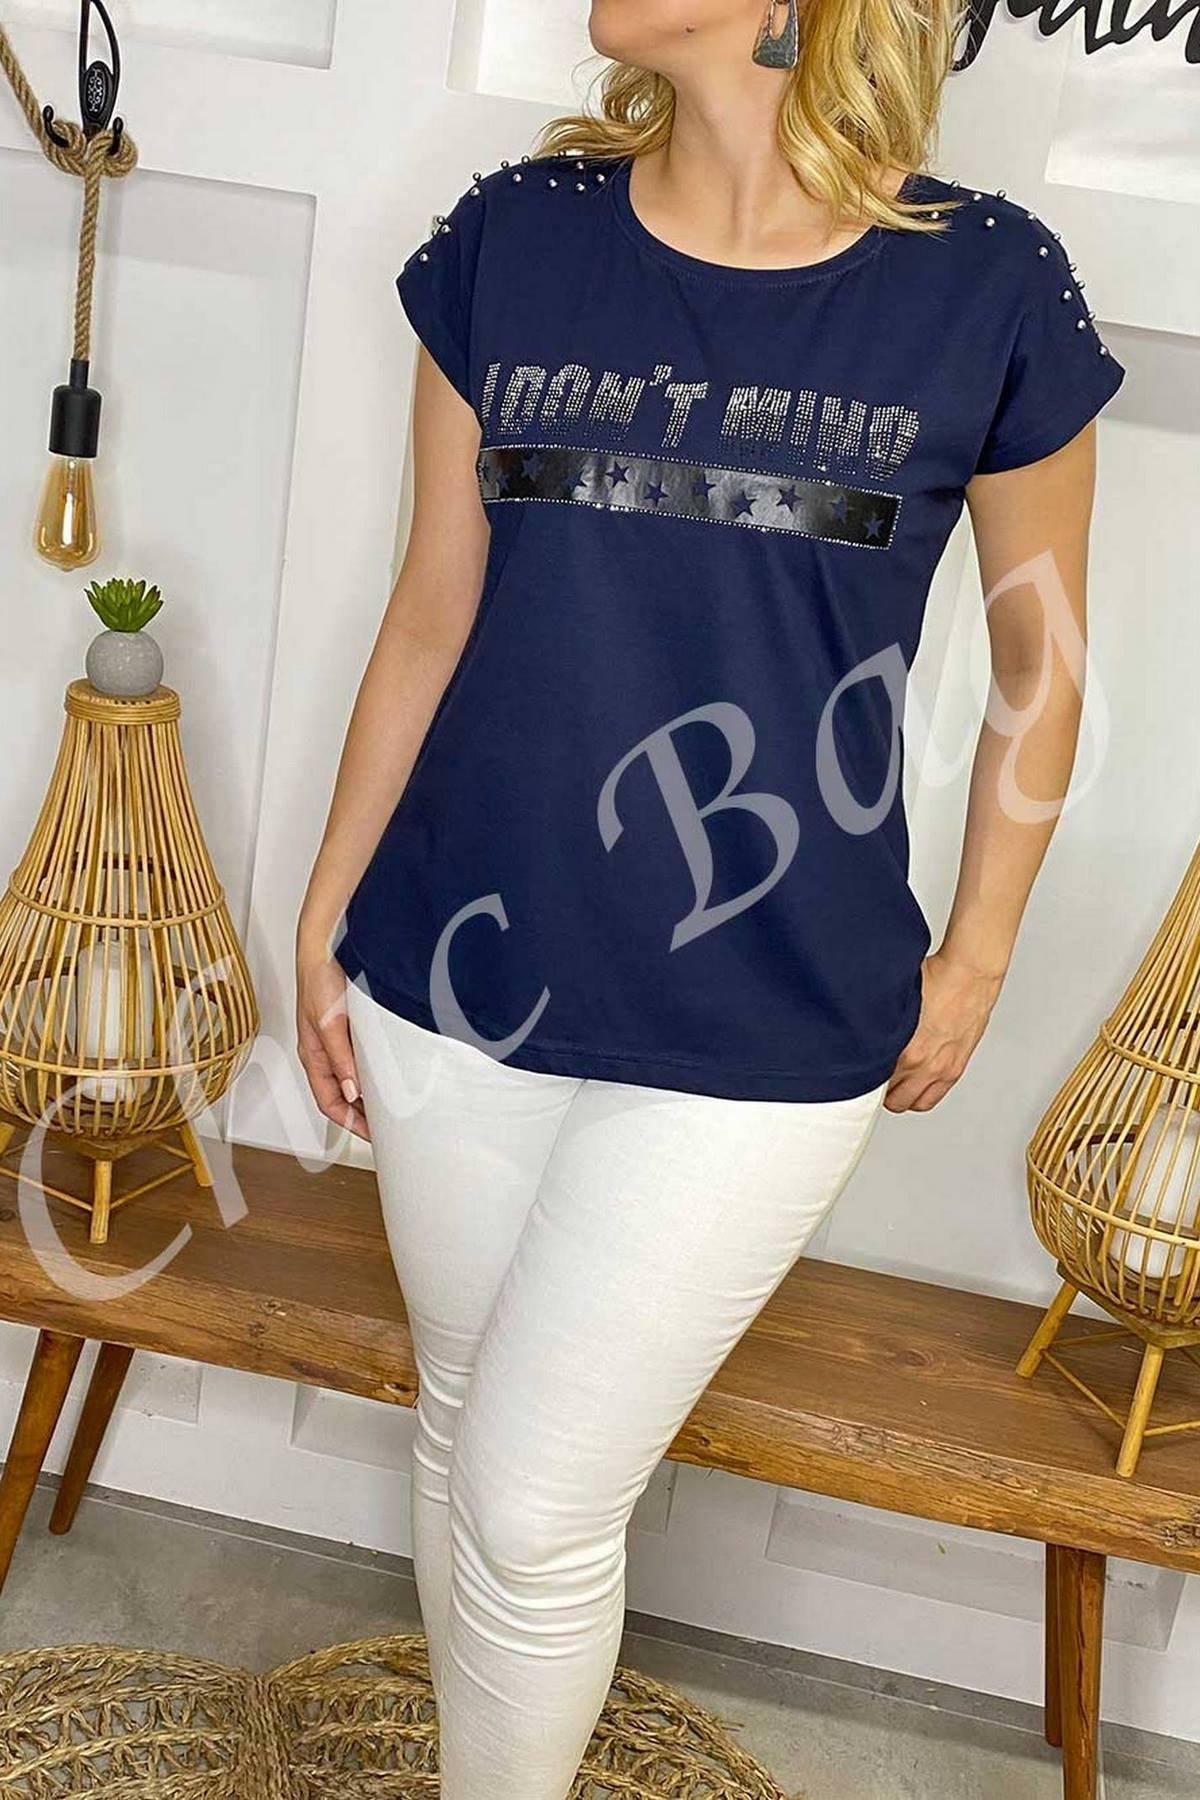 https://resim.chicbag.com.tr/p000955/lcv/i-dont-mind-baski-t-shirt-swns-01df4f8b51aa.